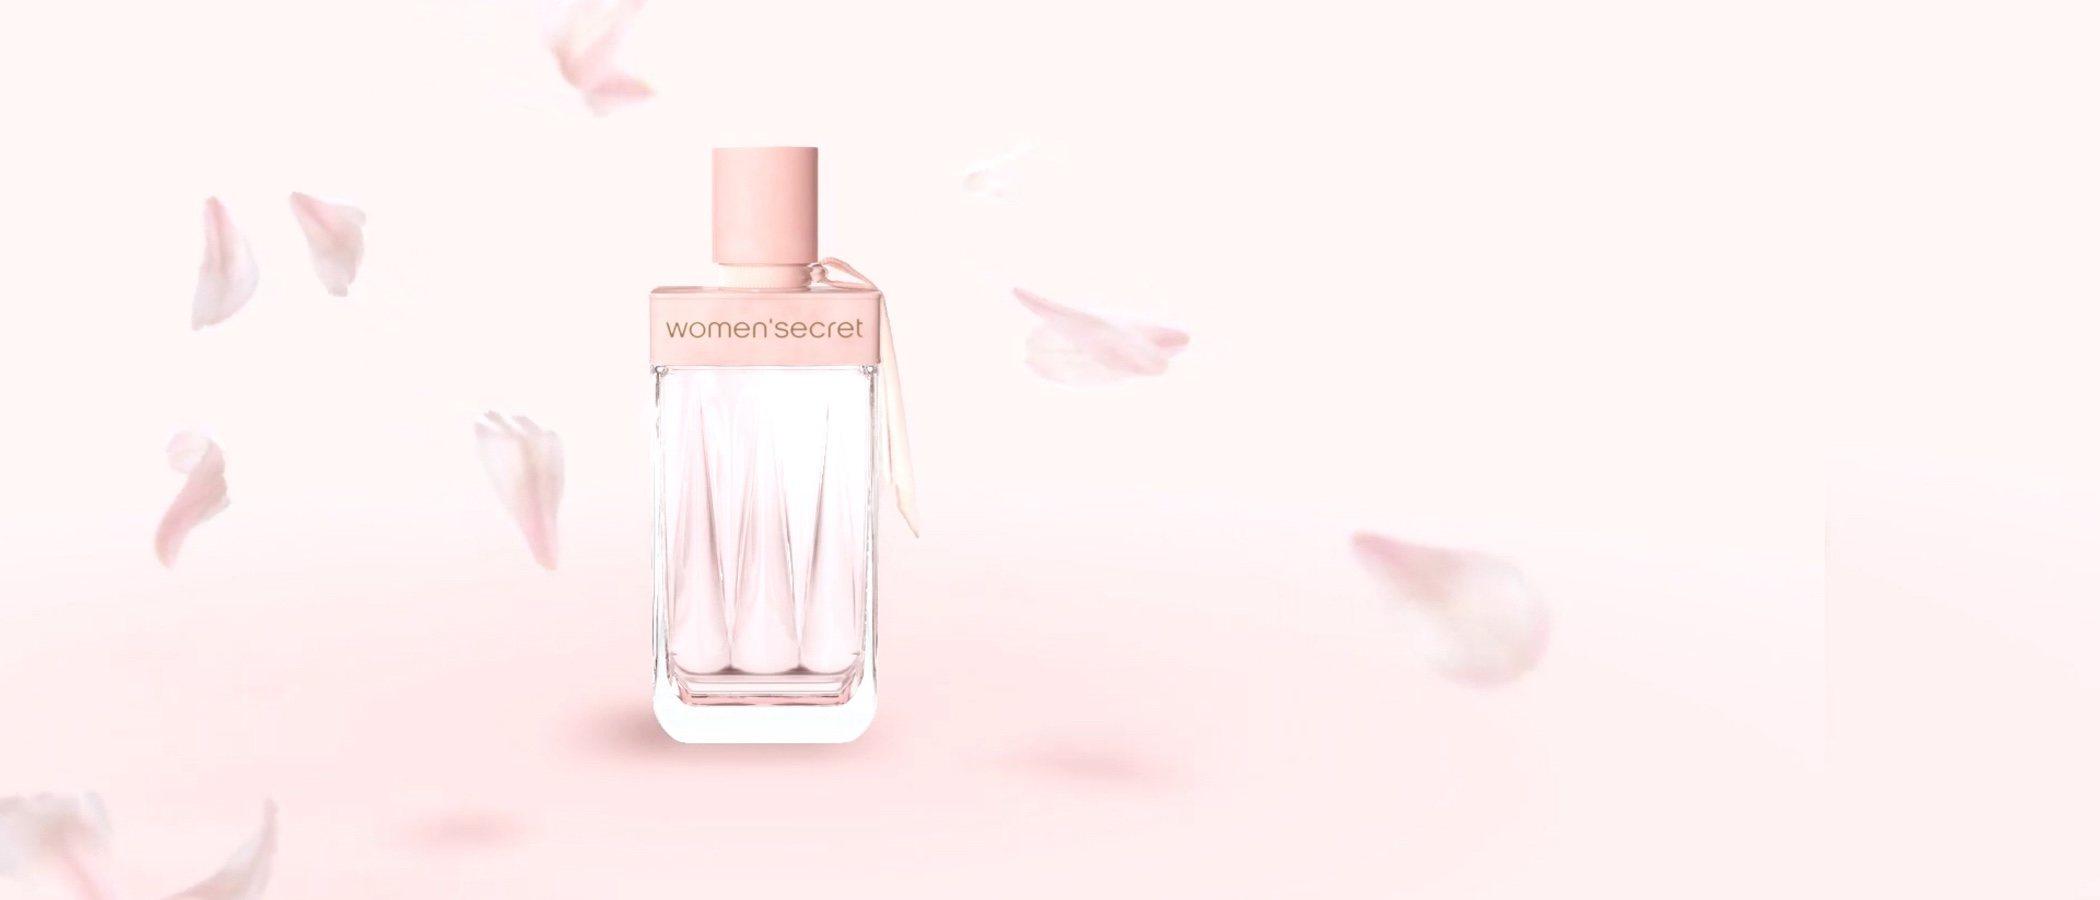 Así de dulce es 'Intimate', el nuevo perfume de Women'Secret